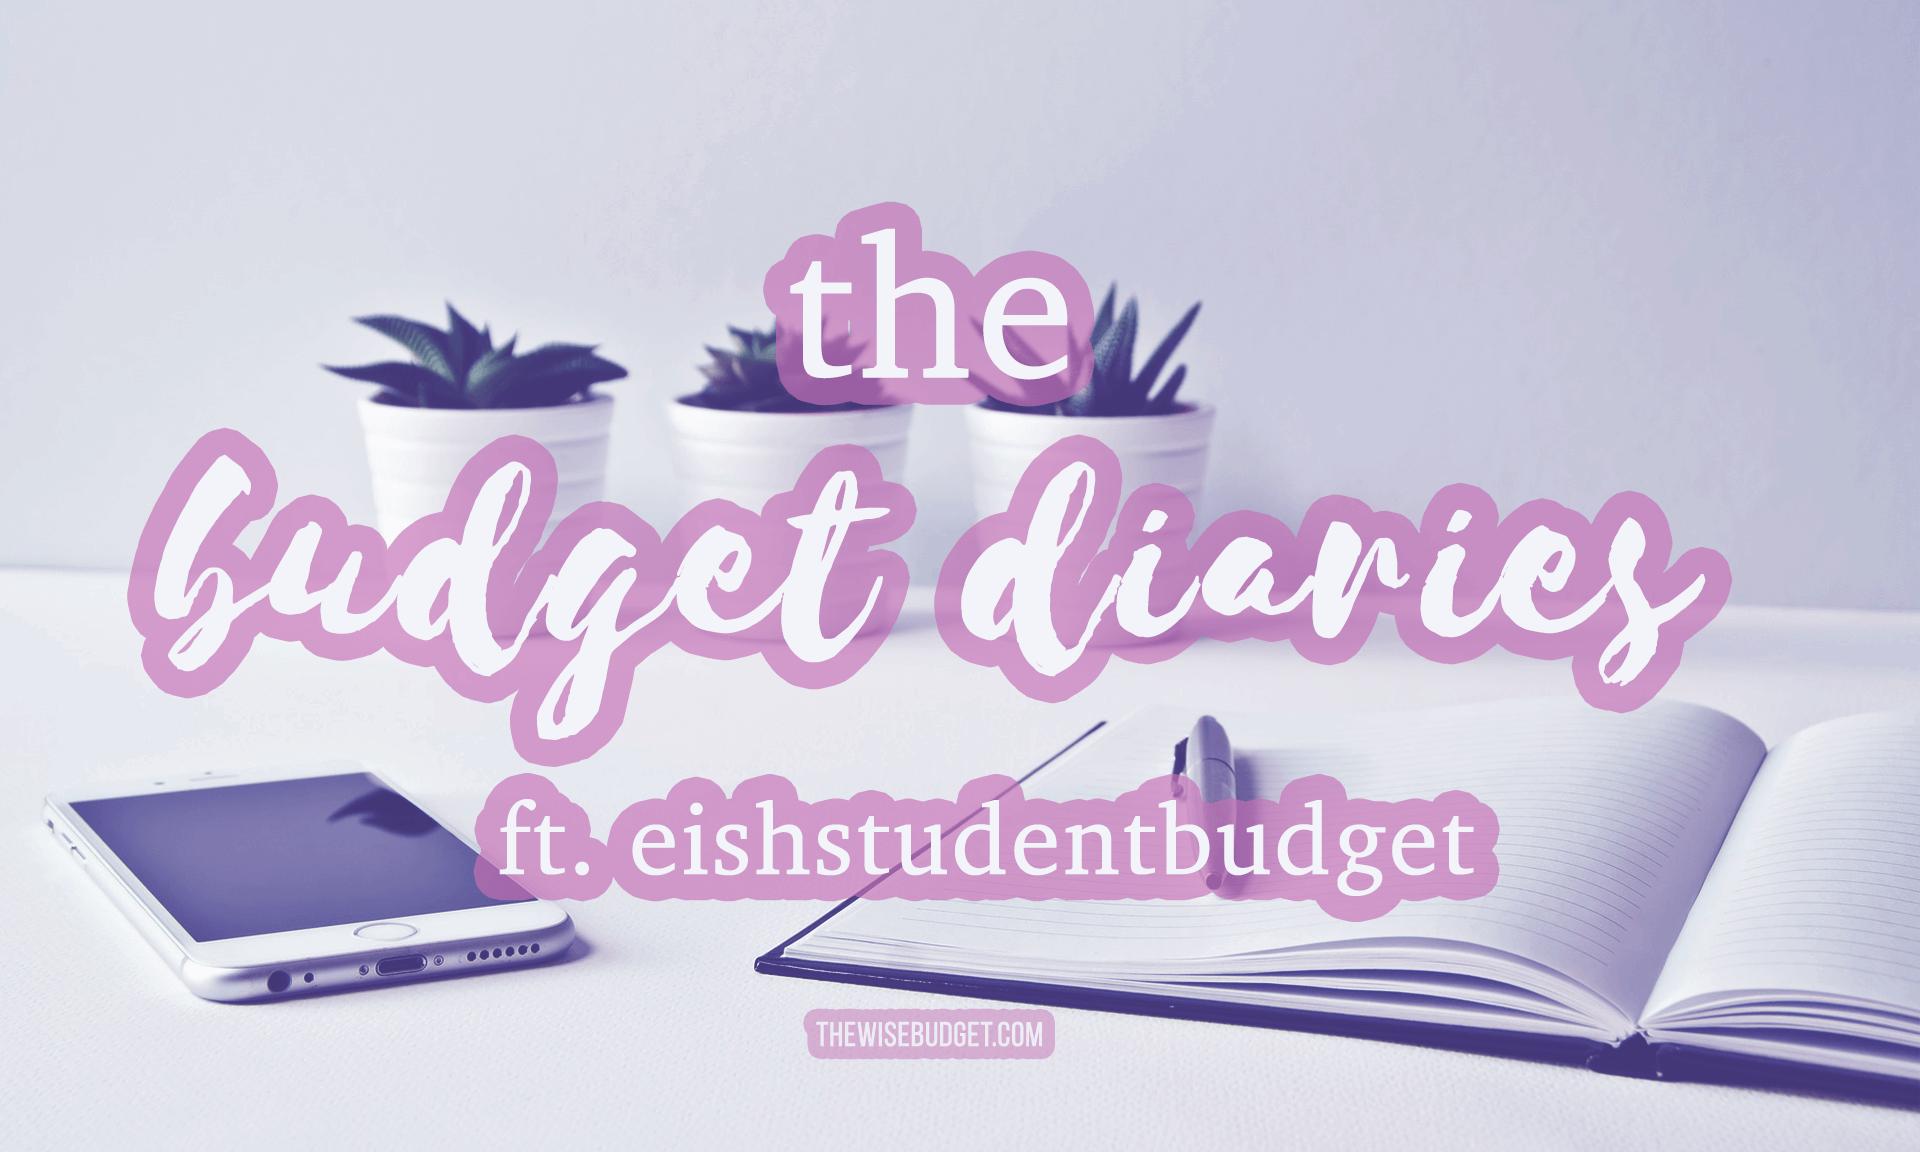 thewisebudget the budget diaries interviews eishstudentbudget